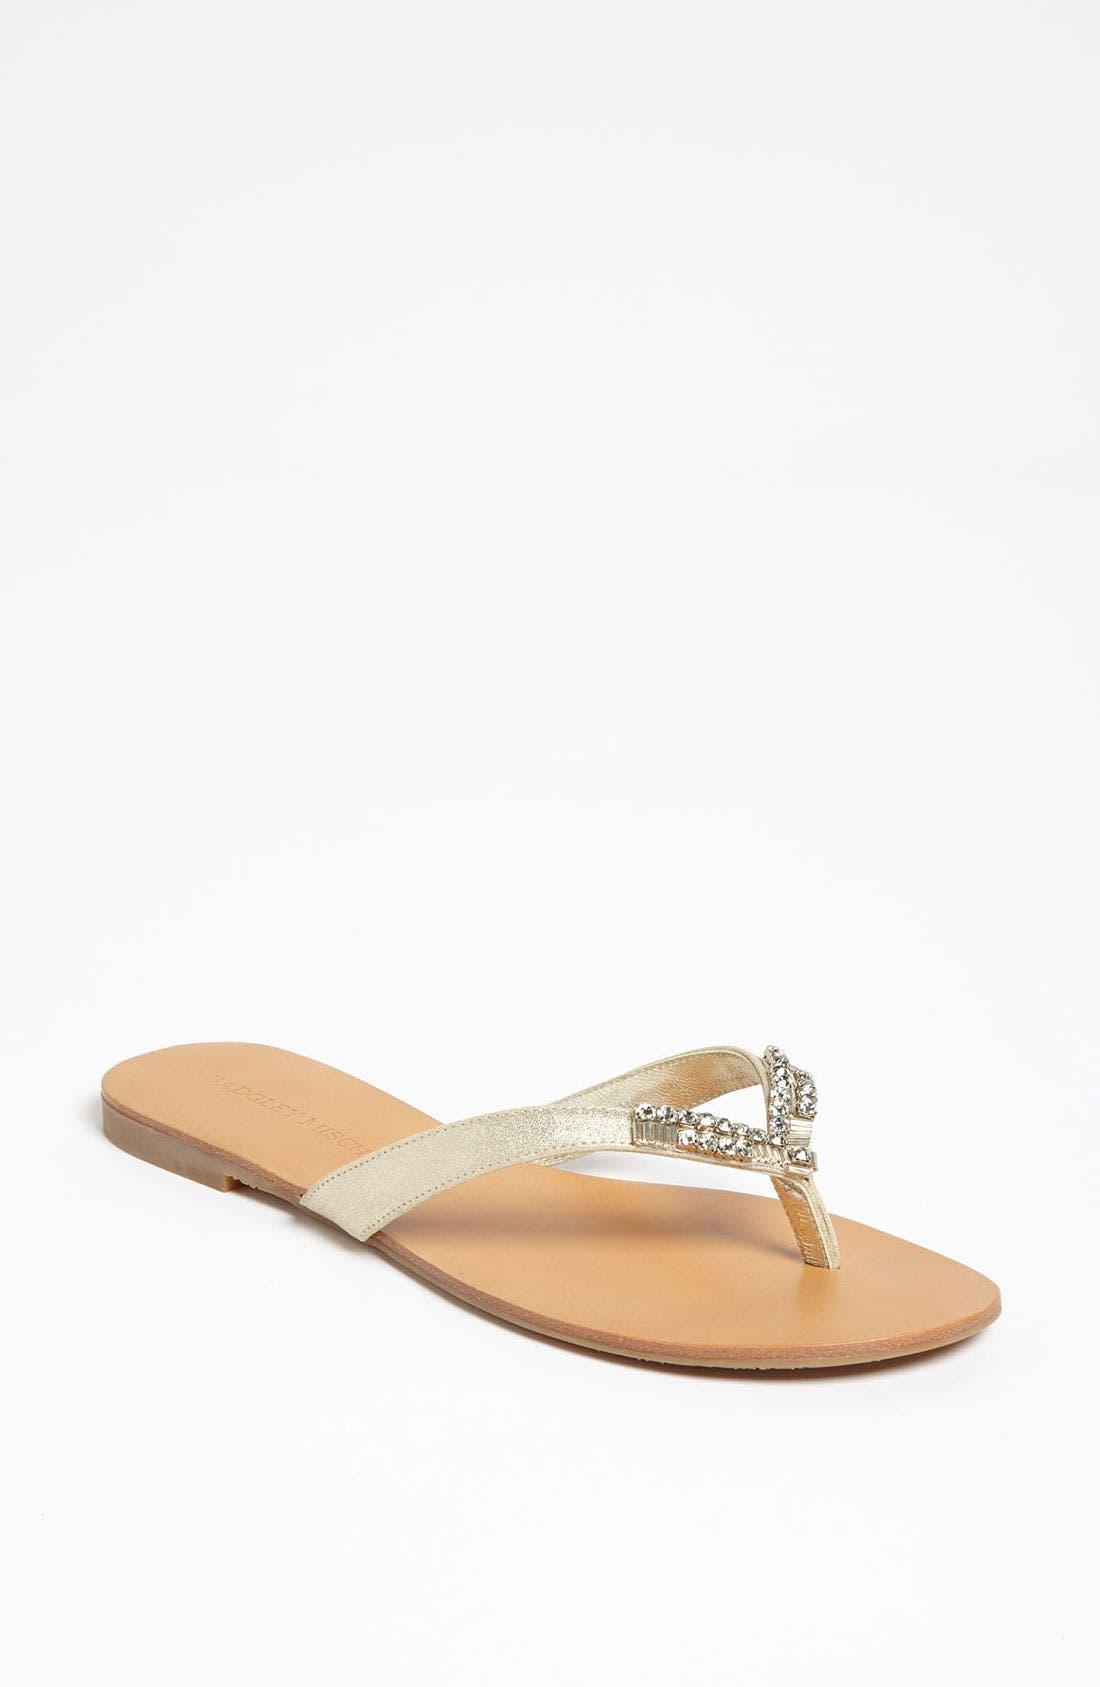 Alternate Image 1 Selected - Badgley Mischka 'Alee' Sandal